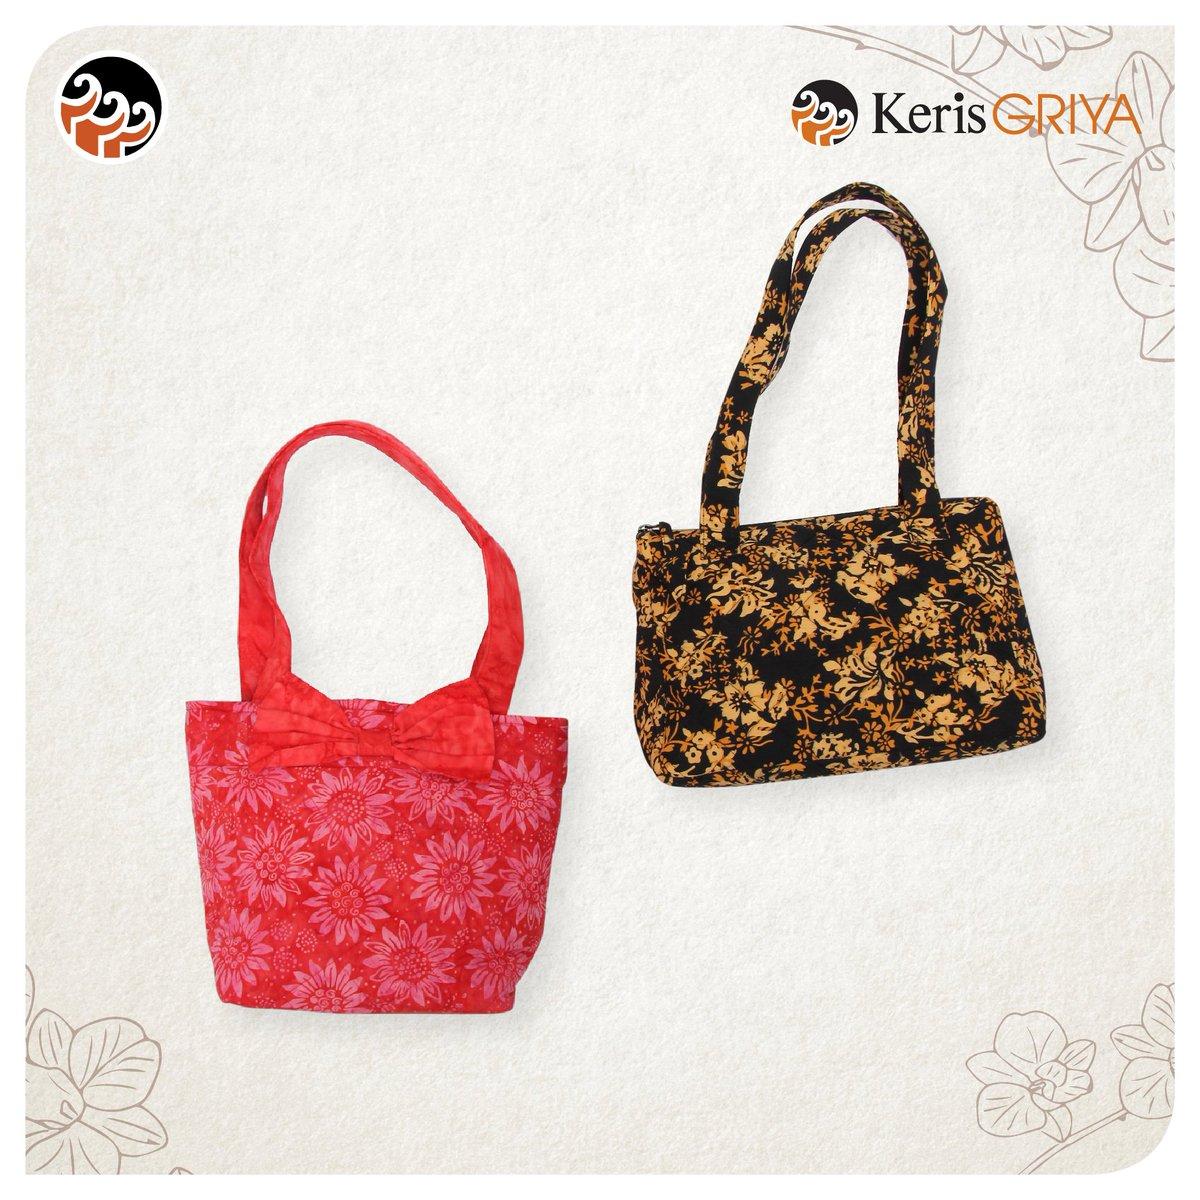 Batik Keris On Twitter Koleksi Tas Mira Merah Dan Citra Hitam Dari Griya By